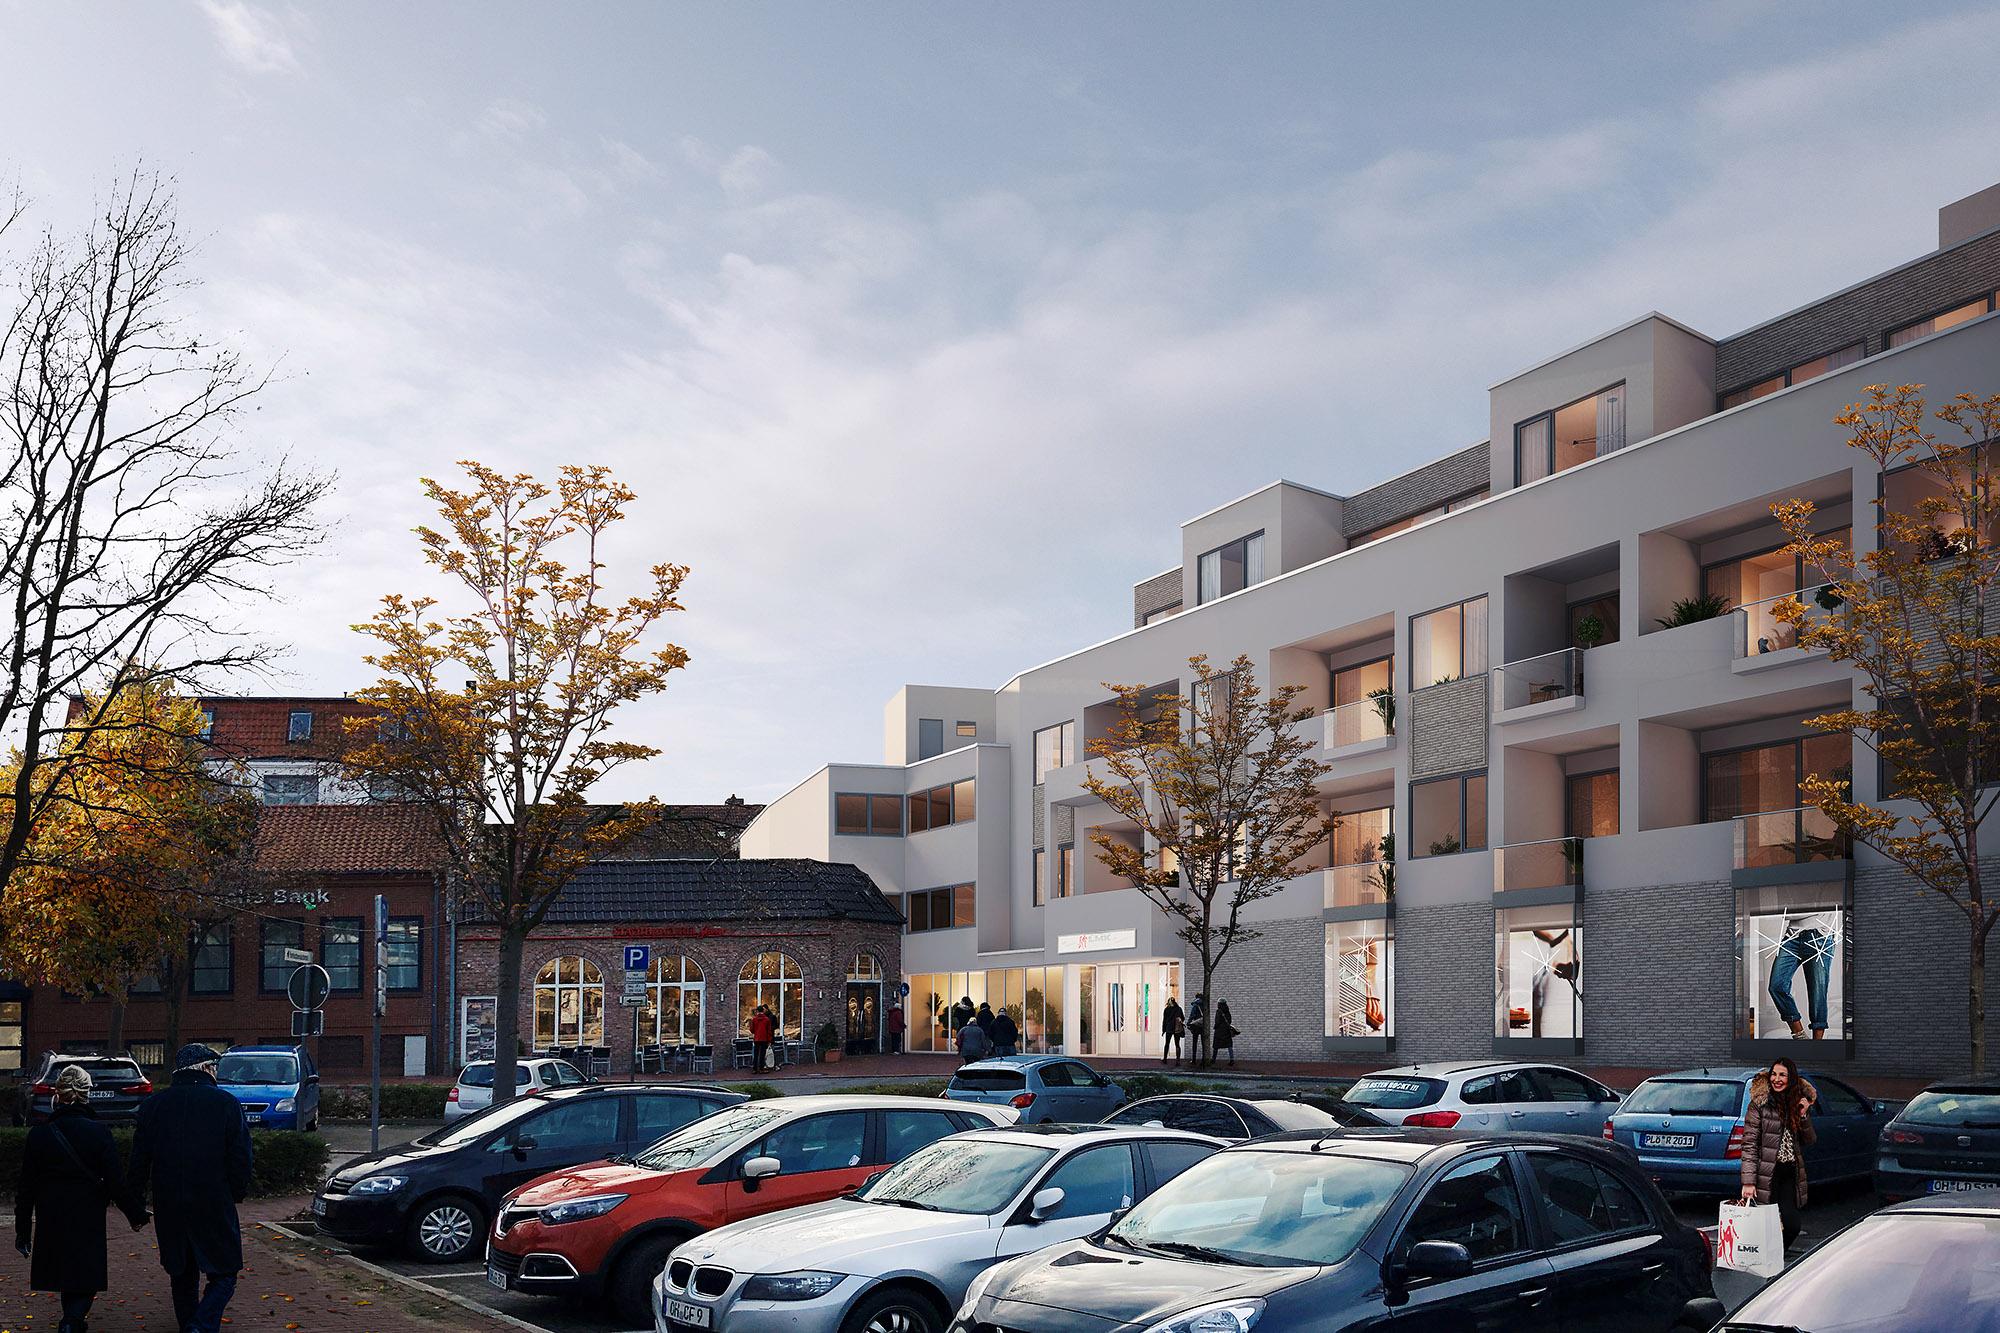 mojoimages architekturvisualisierung Architekturbuero Minde Vermarktung Kaufhaus Eutin 02 2017